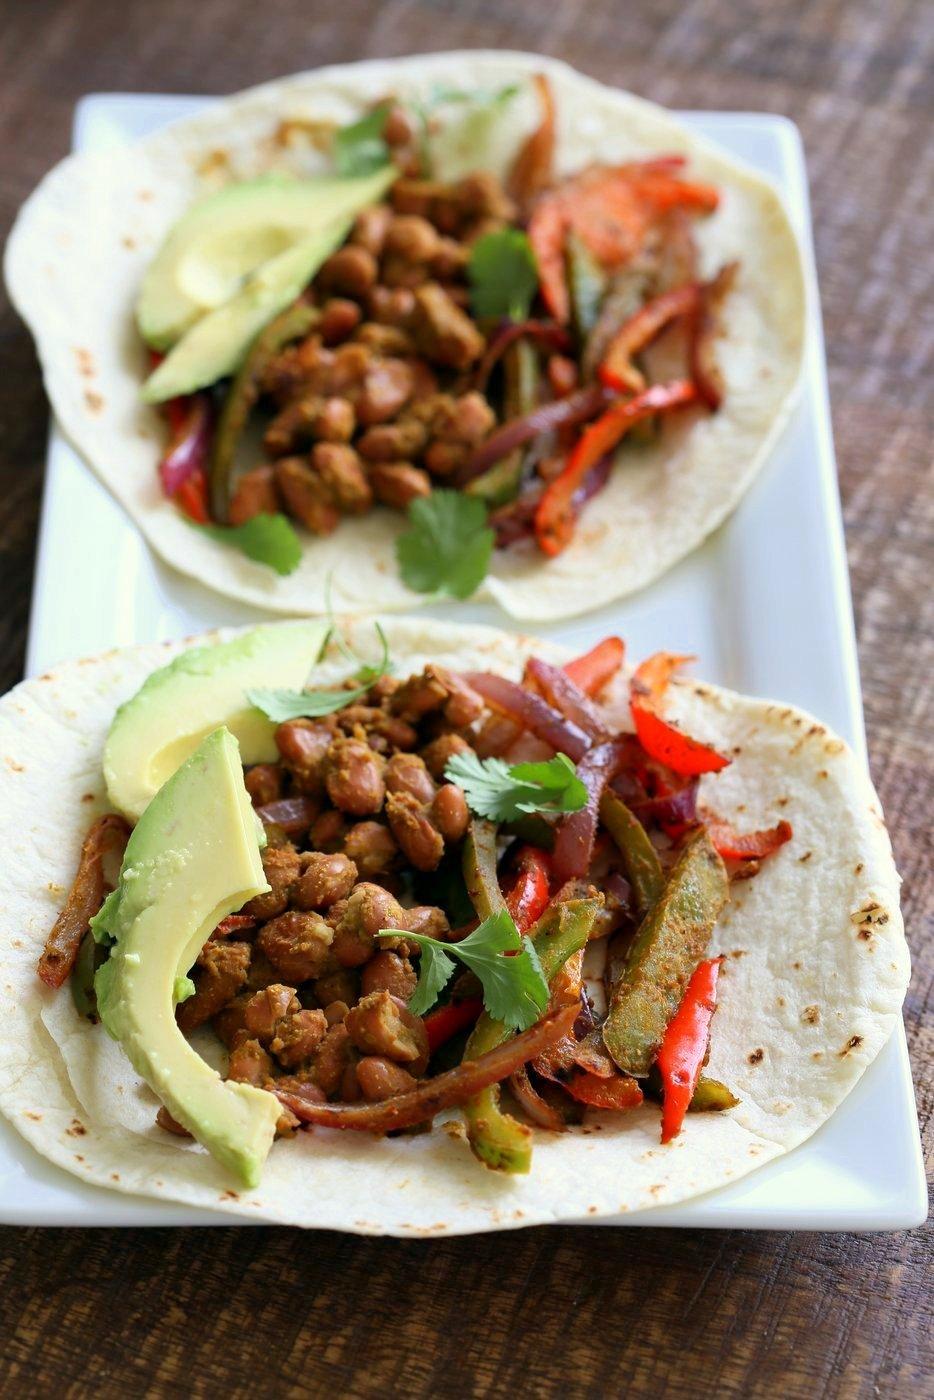 Veggie Pinto Bean Fajita Tacos with Cilantro Chile Marinade. Amazing Fajita Marinade for veggies and Beans. Vegan Gluten-free Soy-free Vegetarian Fajita Recipe | VeganRicha.com